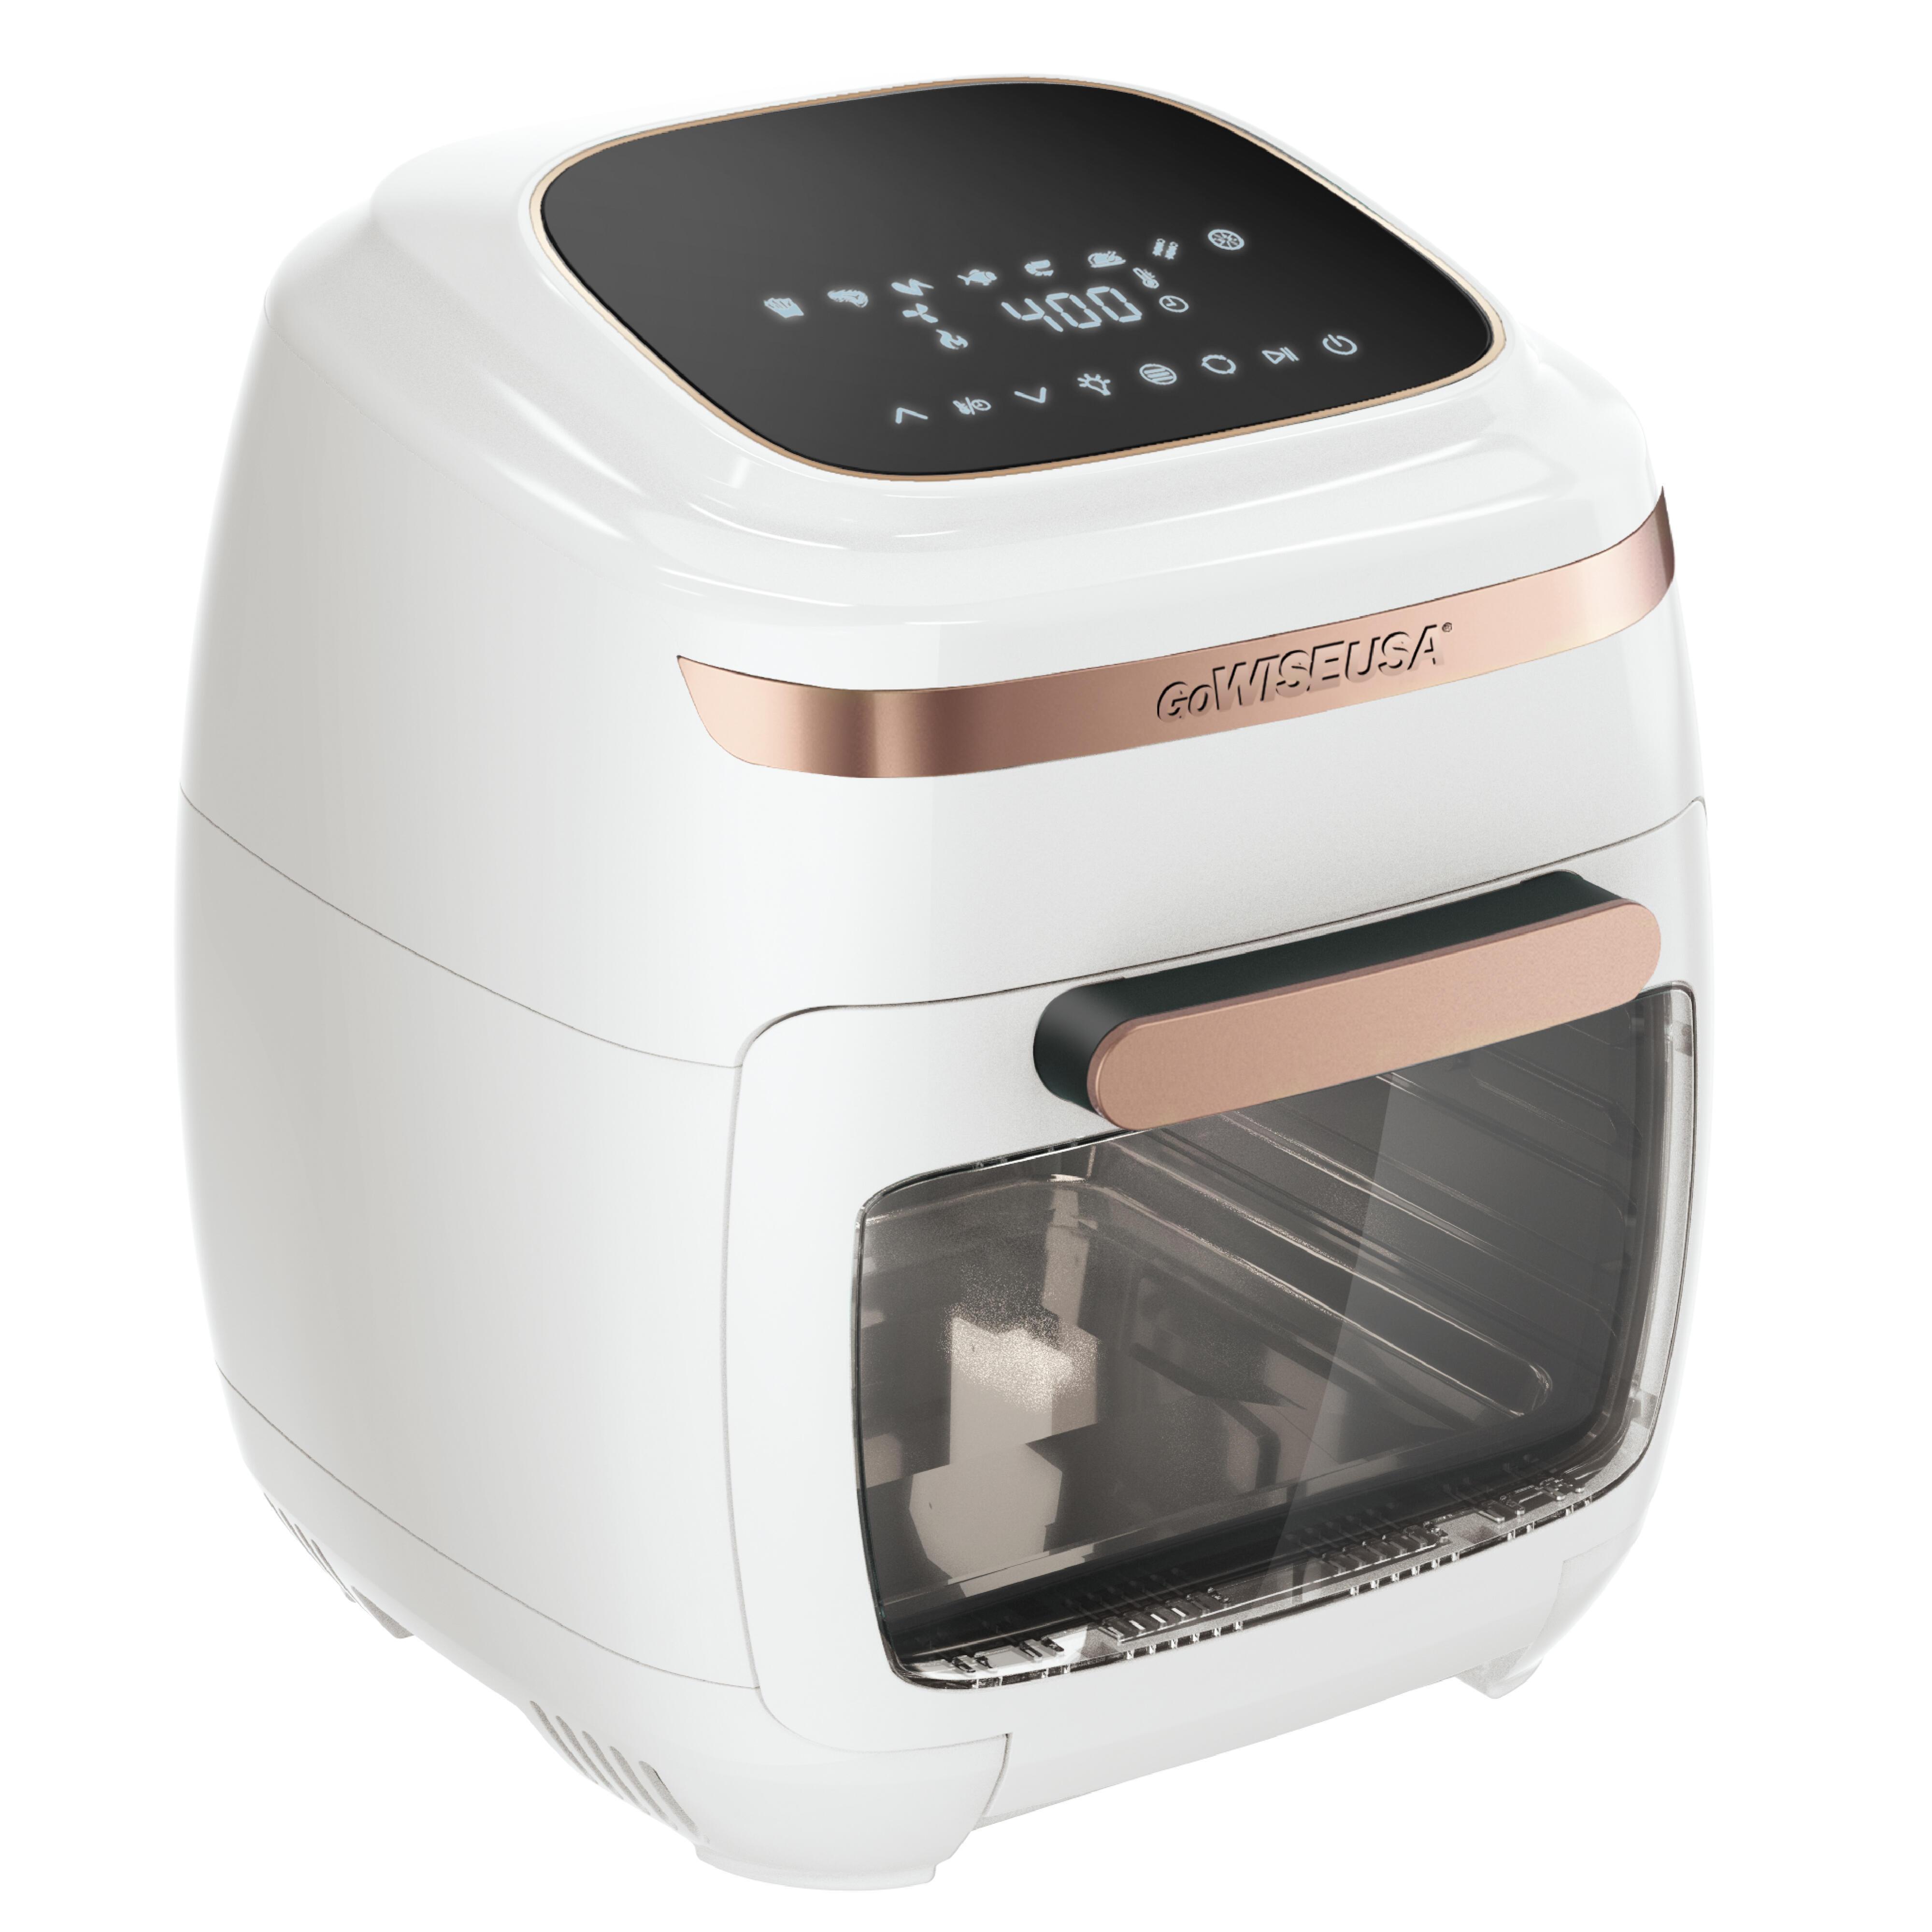 GoWISE USA 1700-Watt White/Rose Gold Multi-Vibe Air Fryer Oven